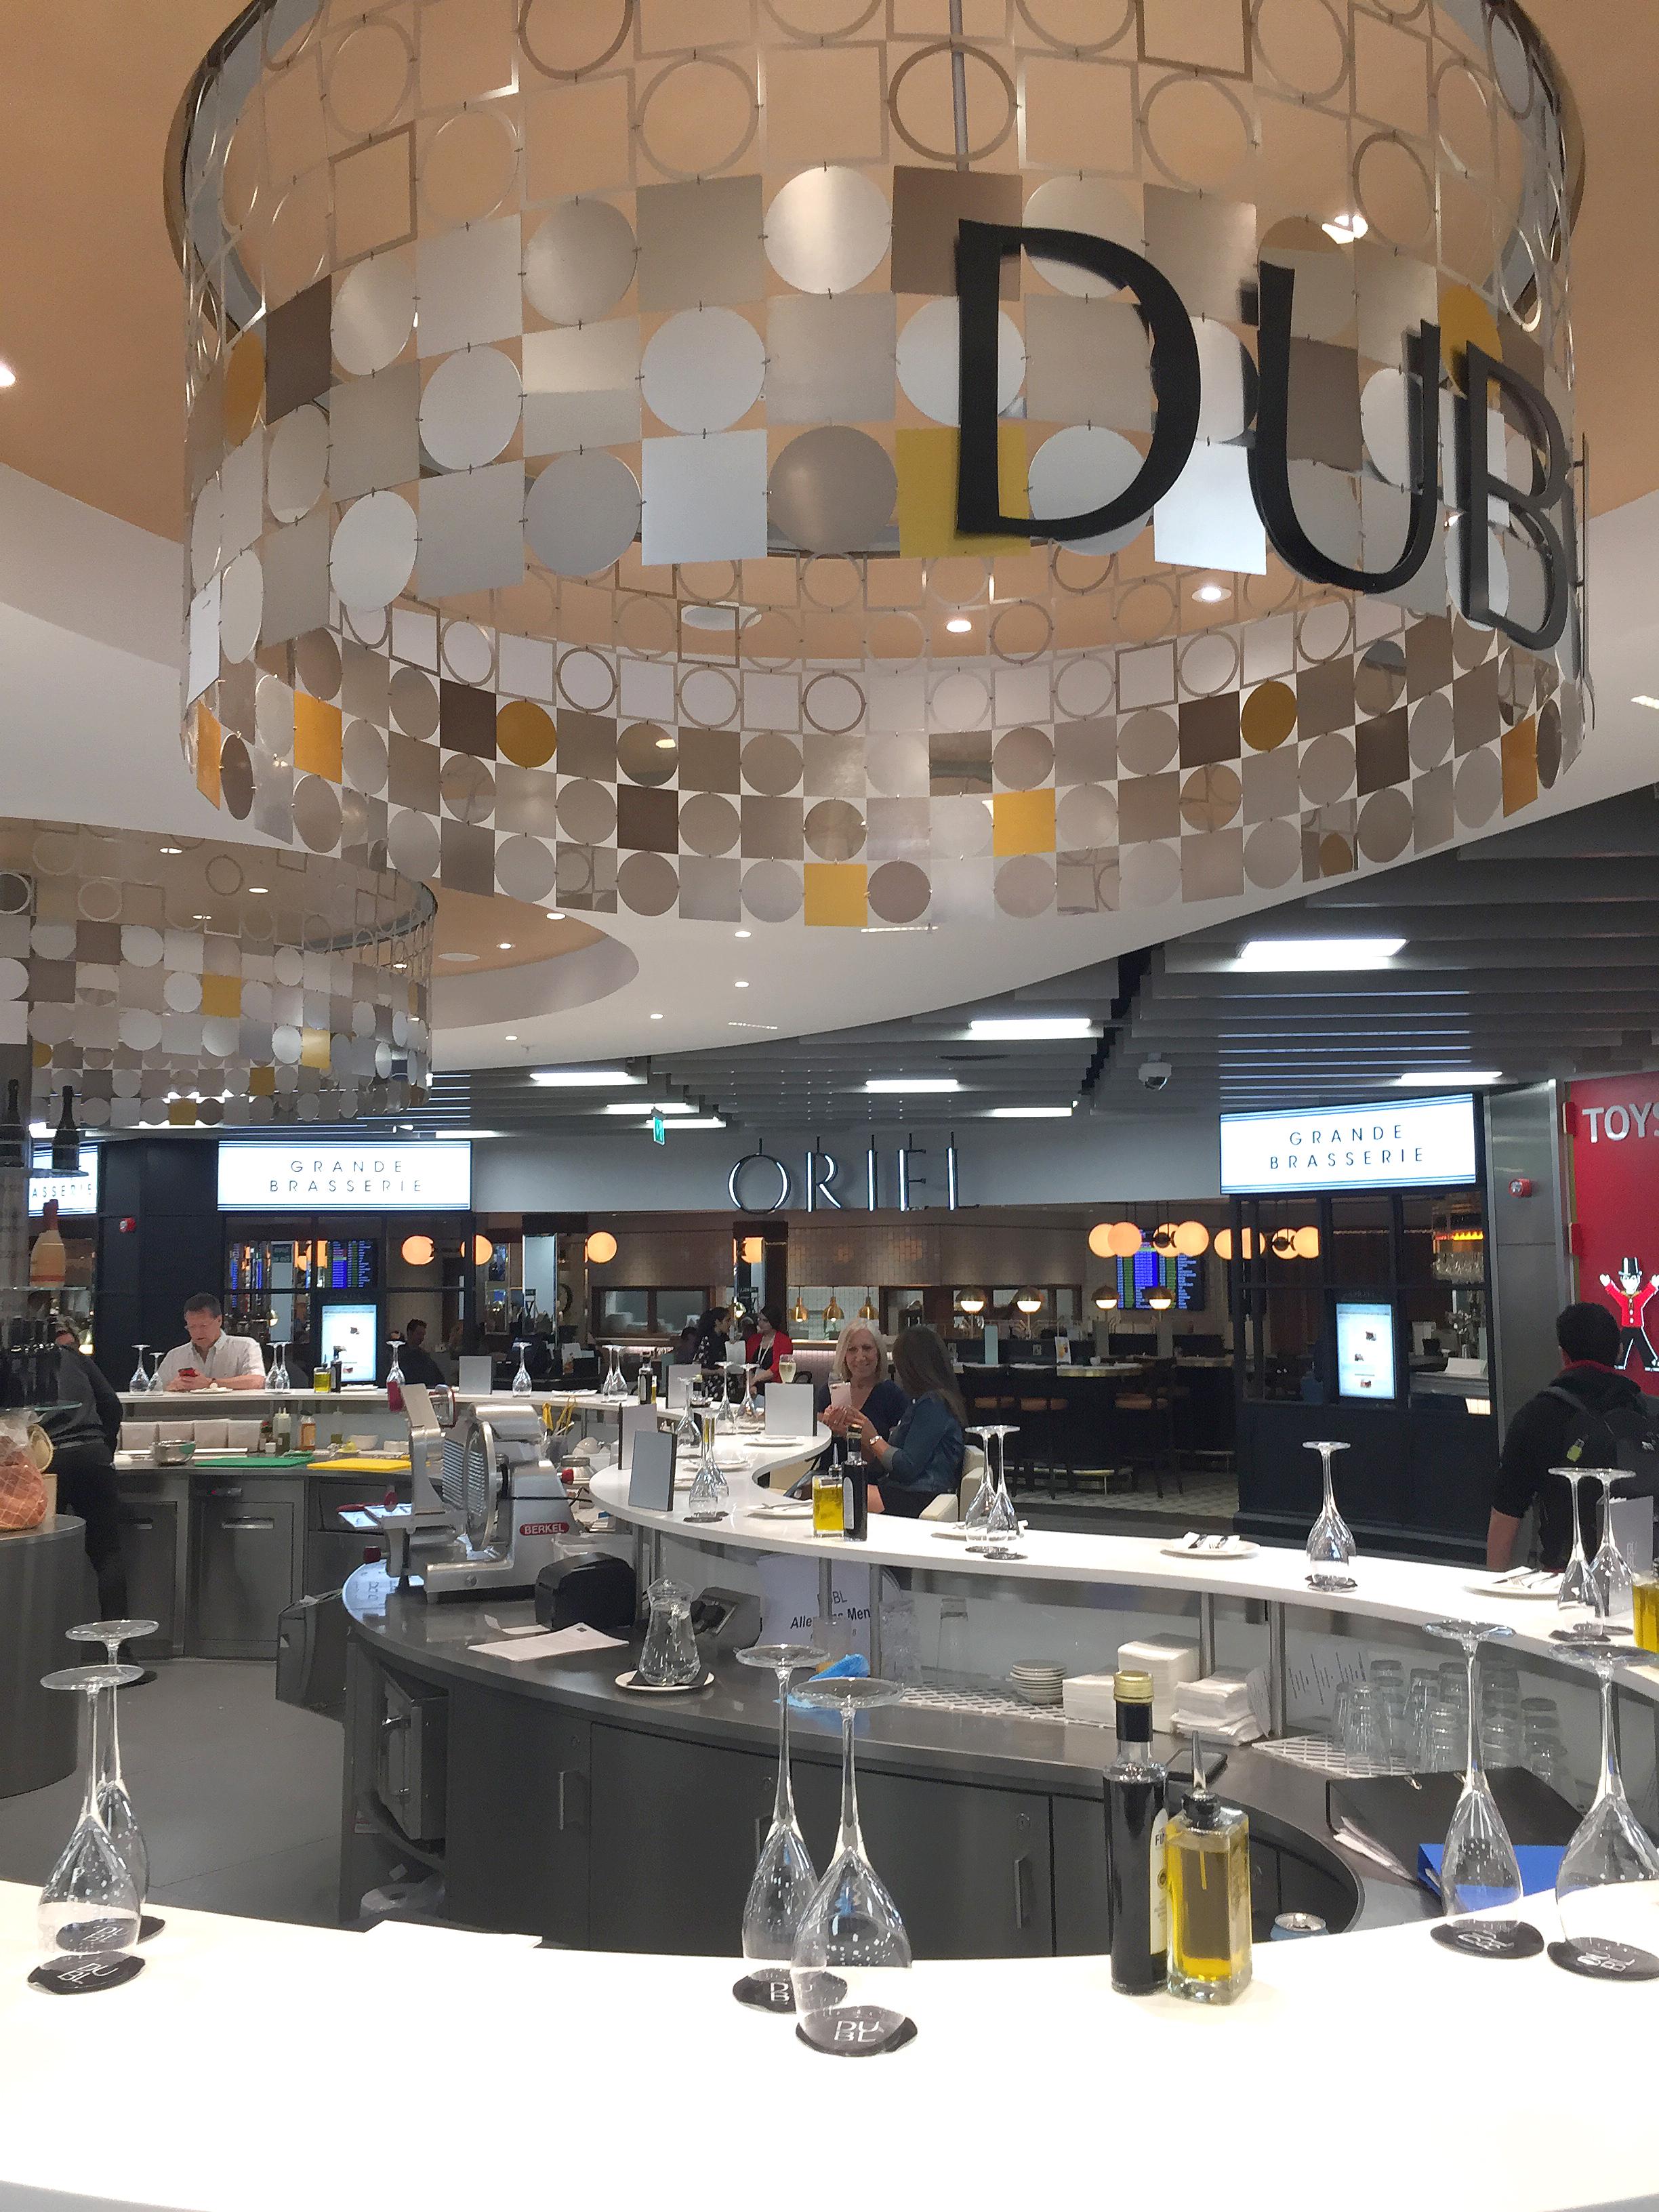 london luton airport_2.jpg